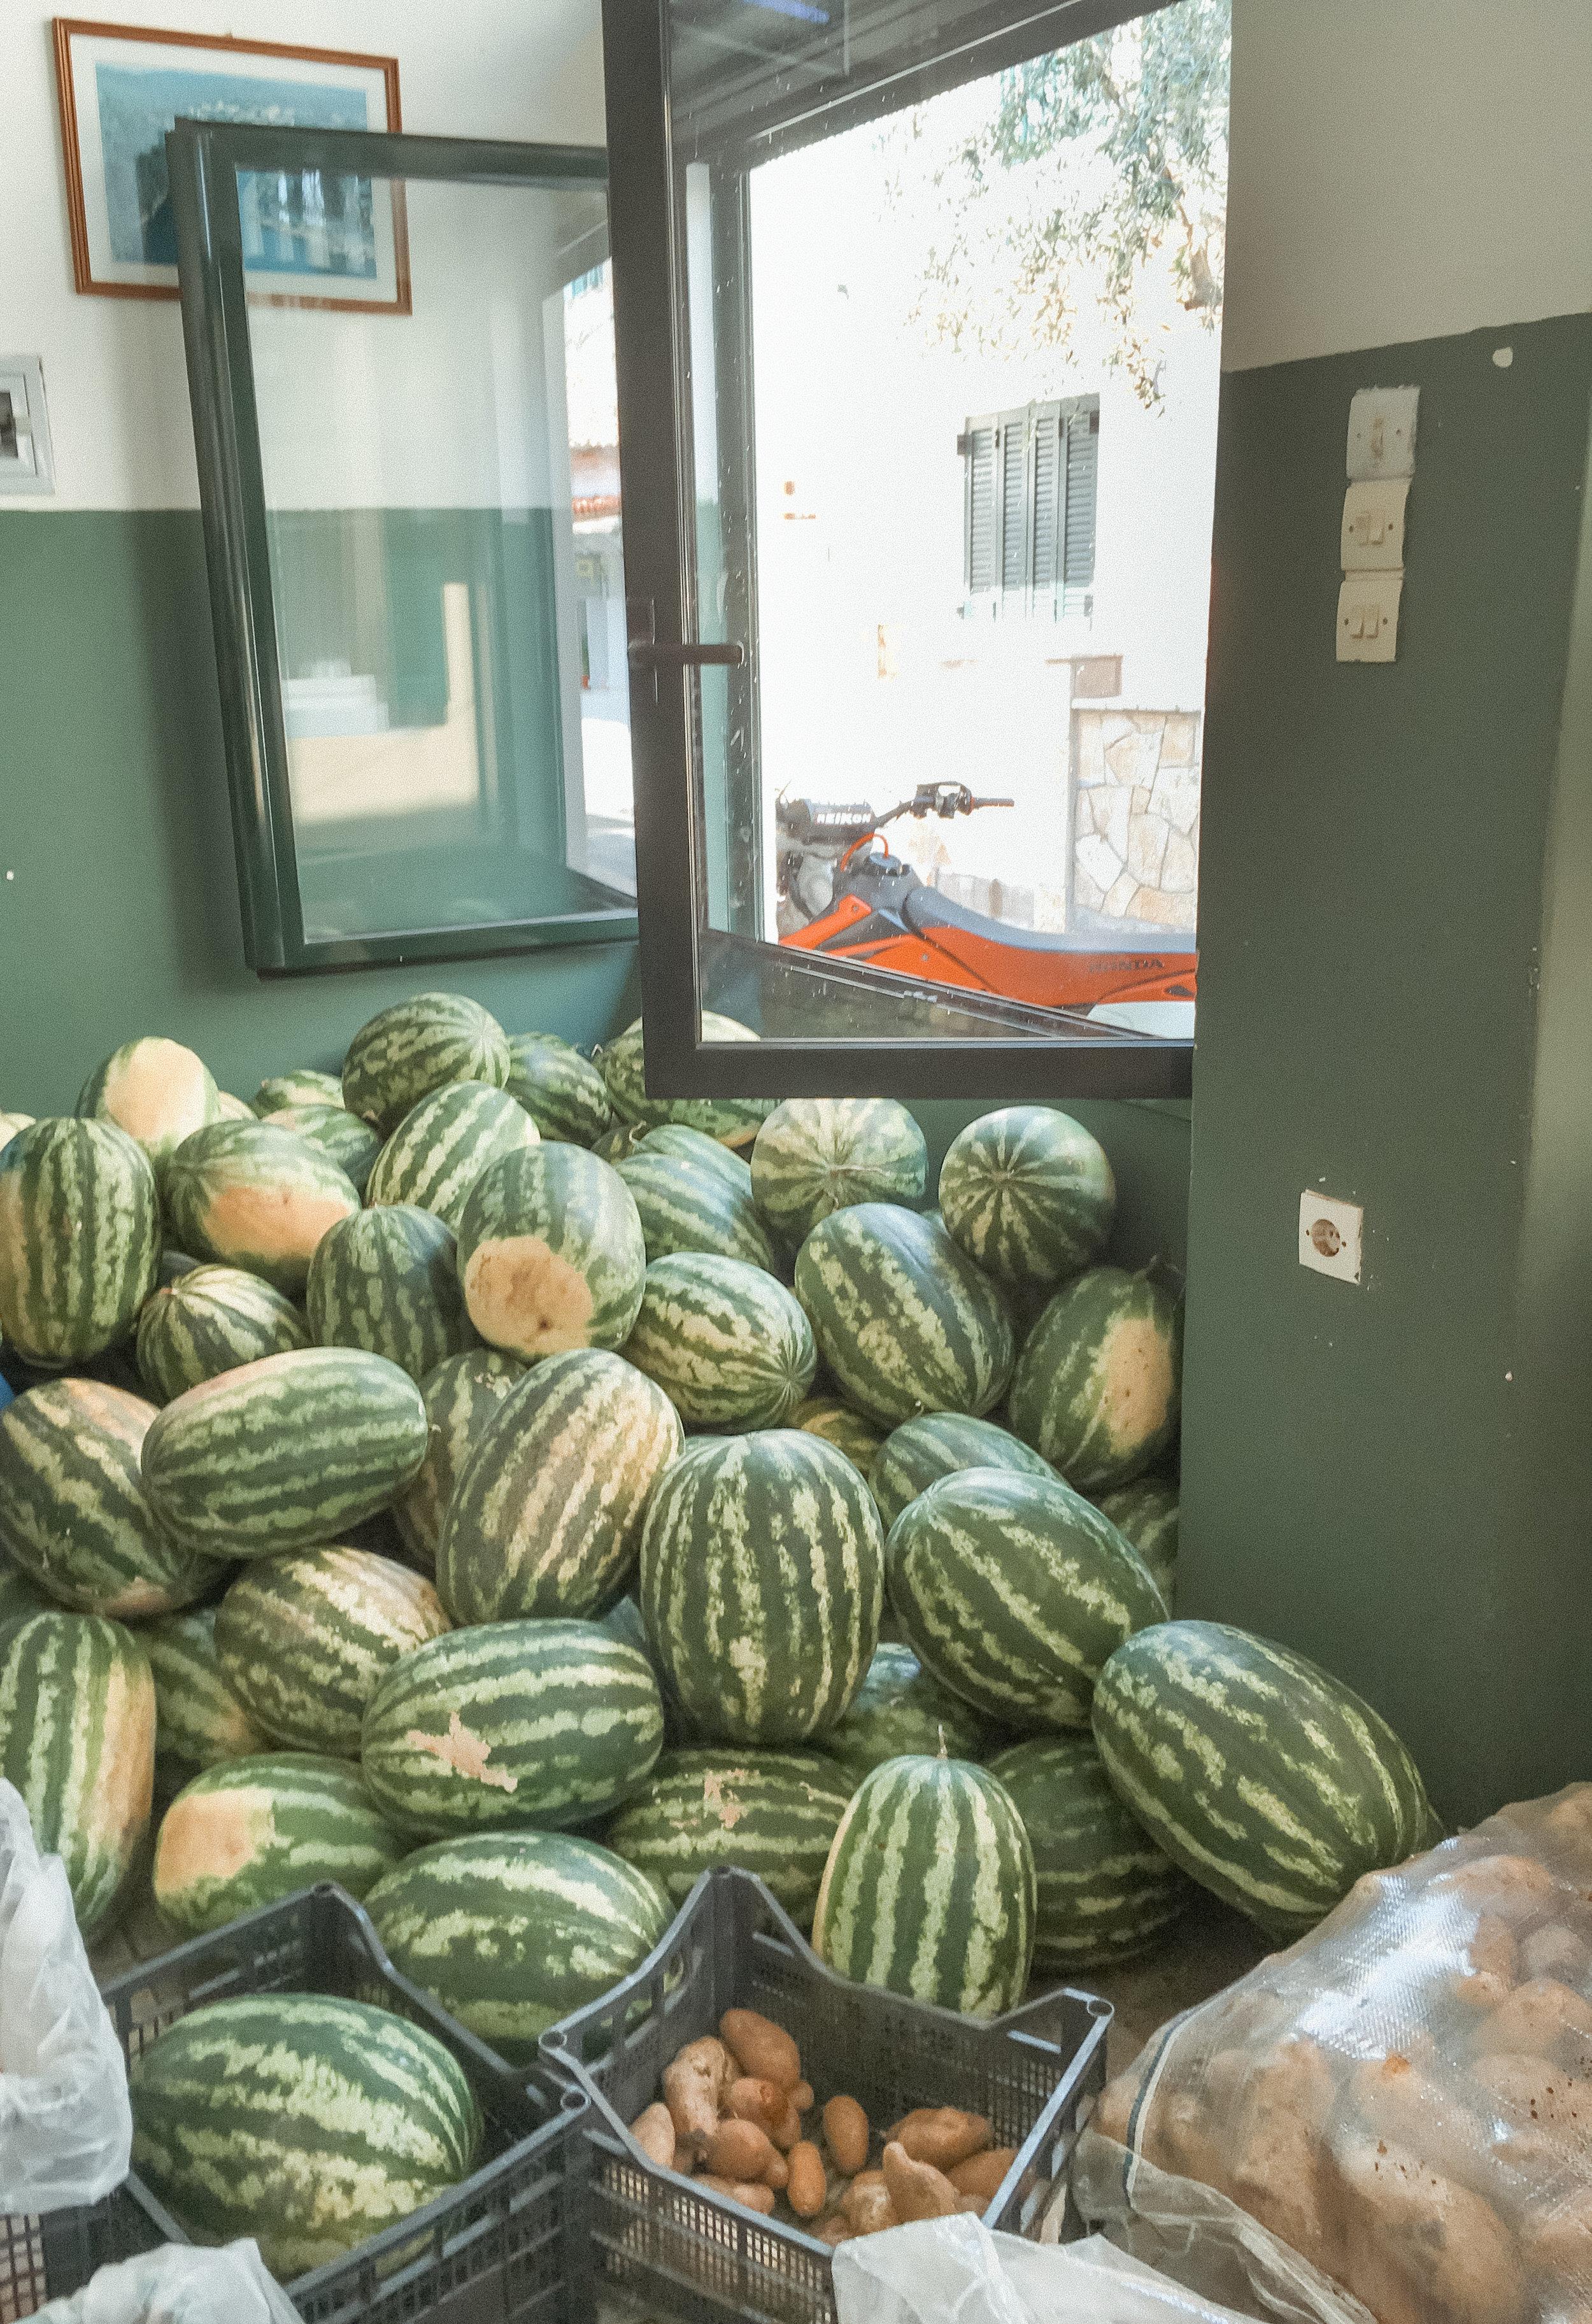 watermelon greece - amelietahiti.com